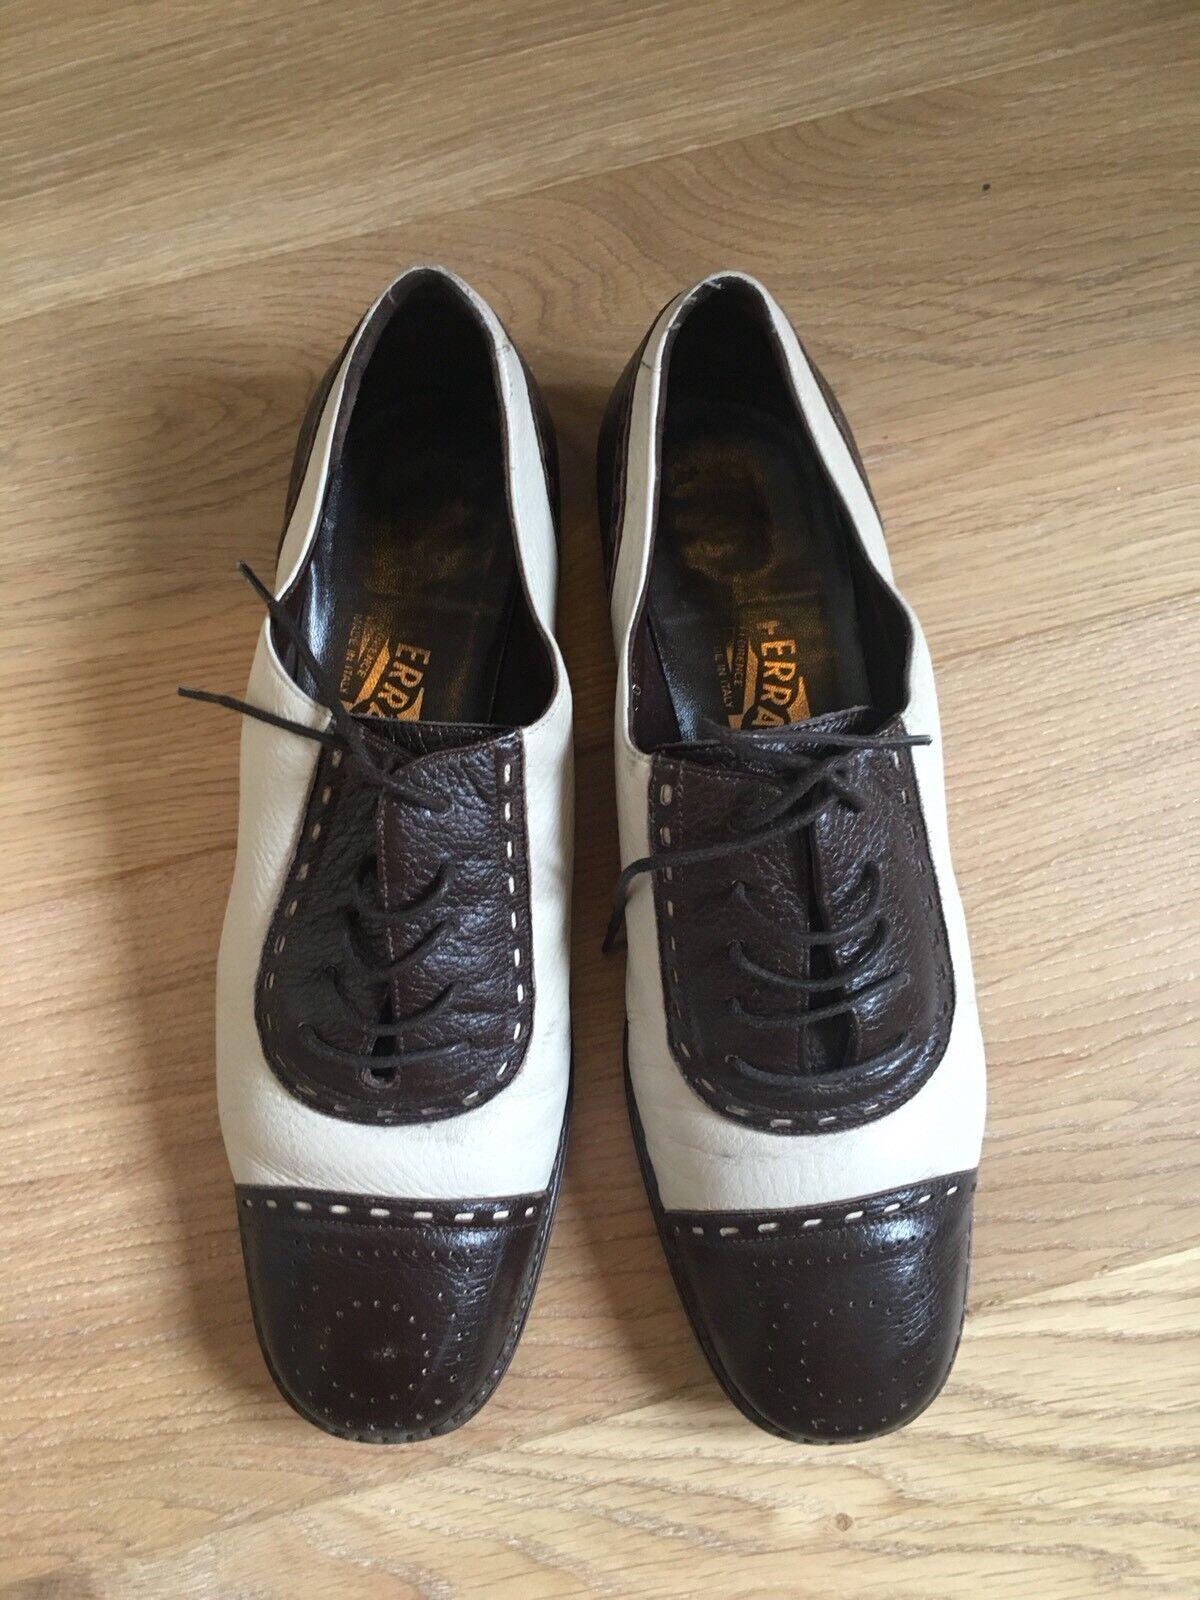 Chaussures derbies biCouleures Salvatore Ferragamo T38 Italien